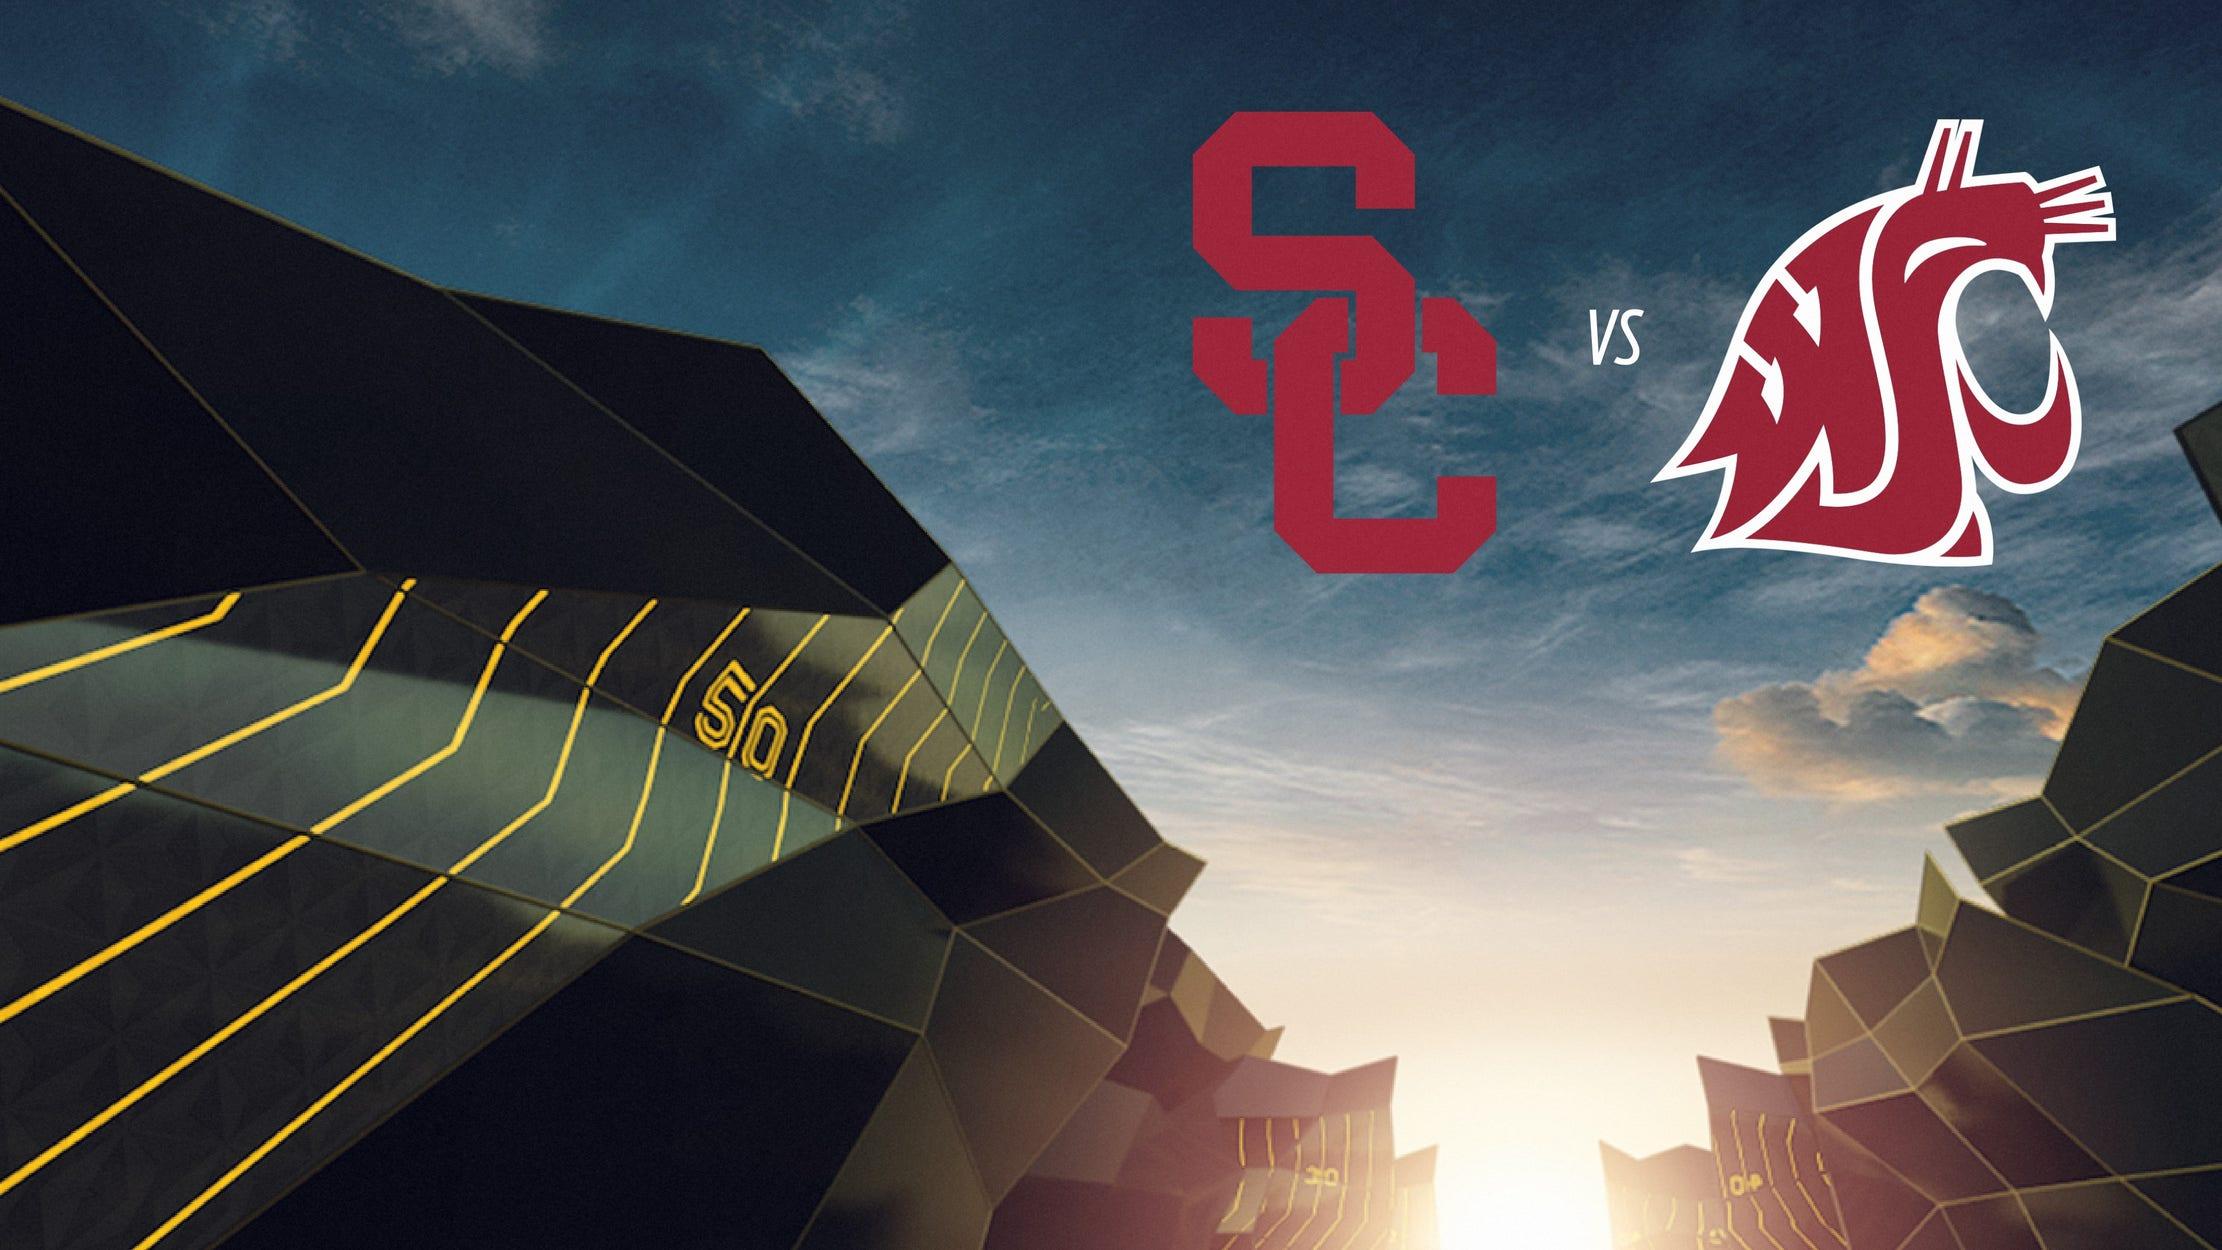 College Football - USC at Washington State seriesDetail